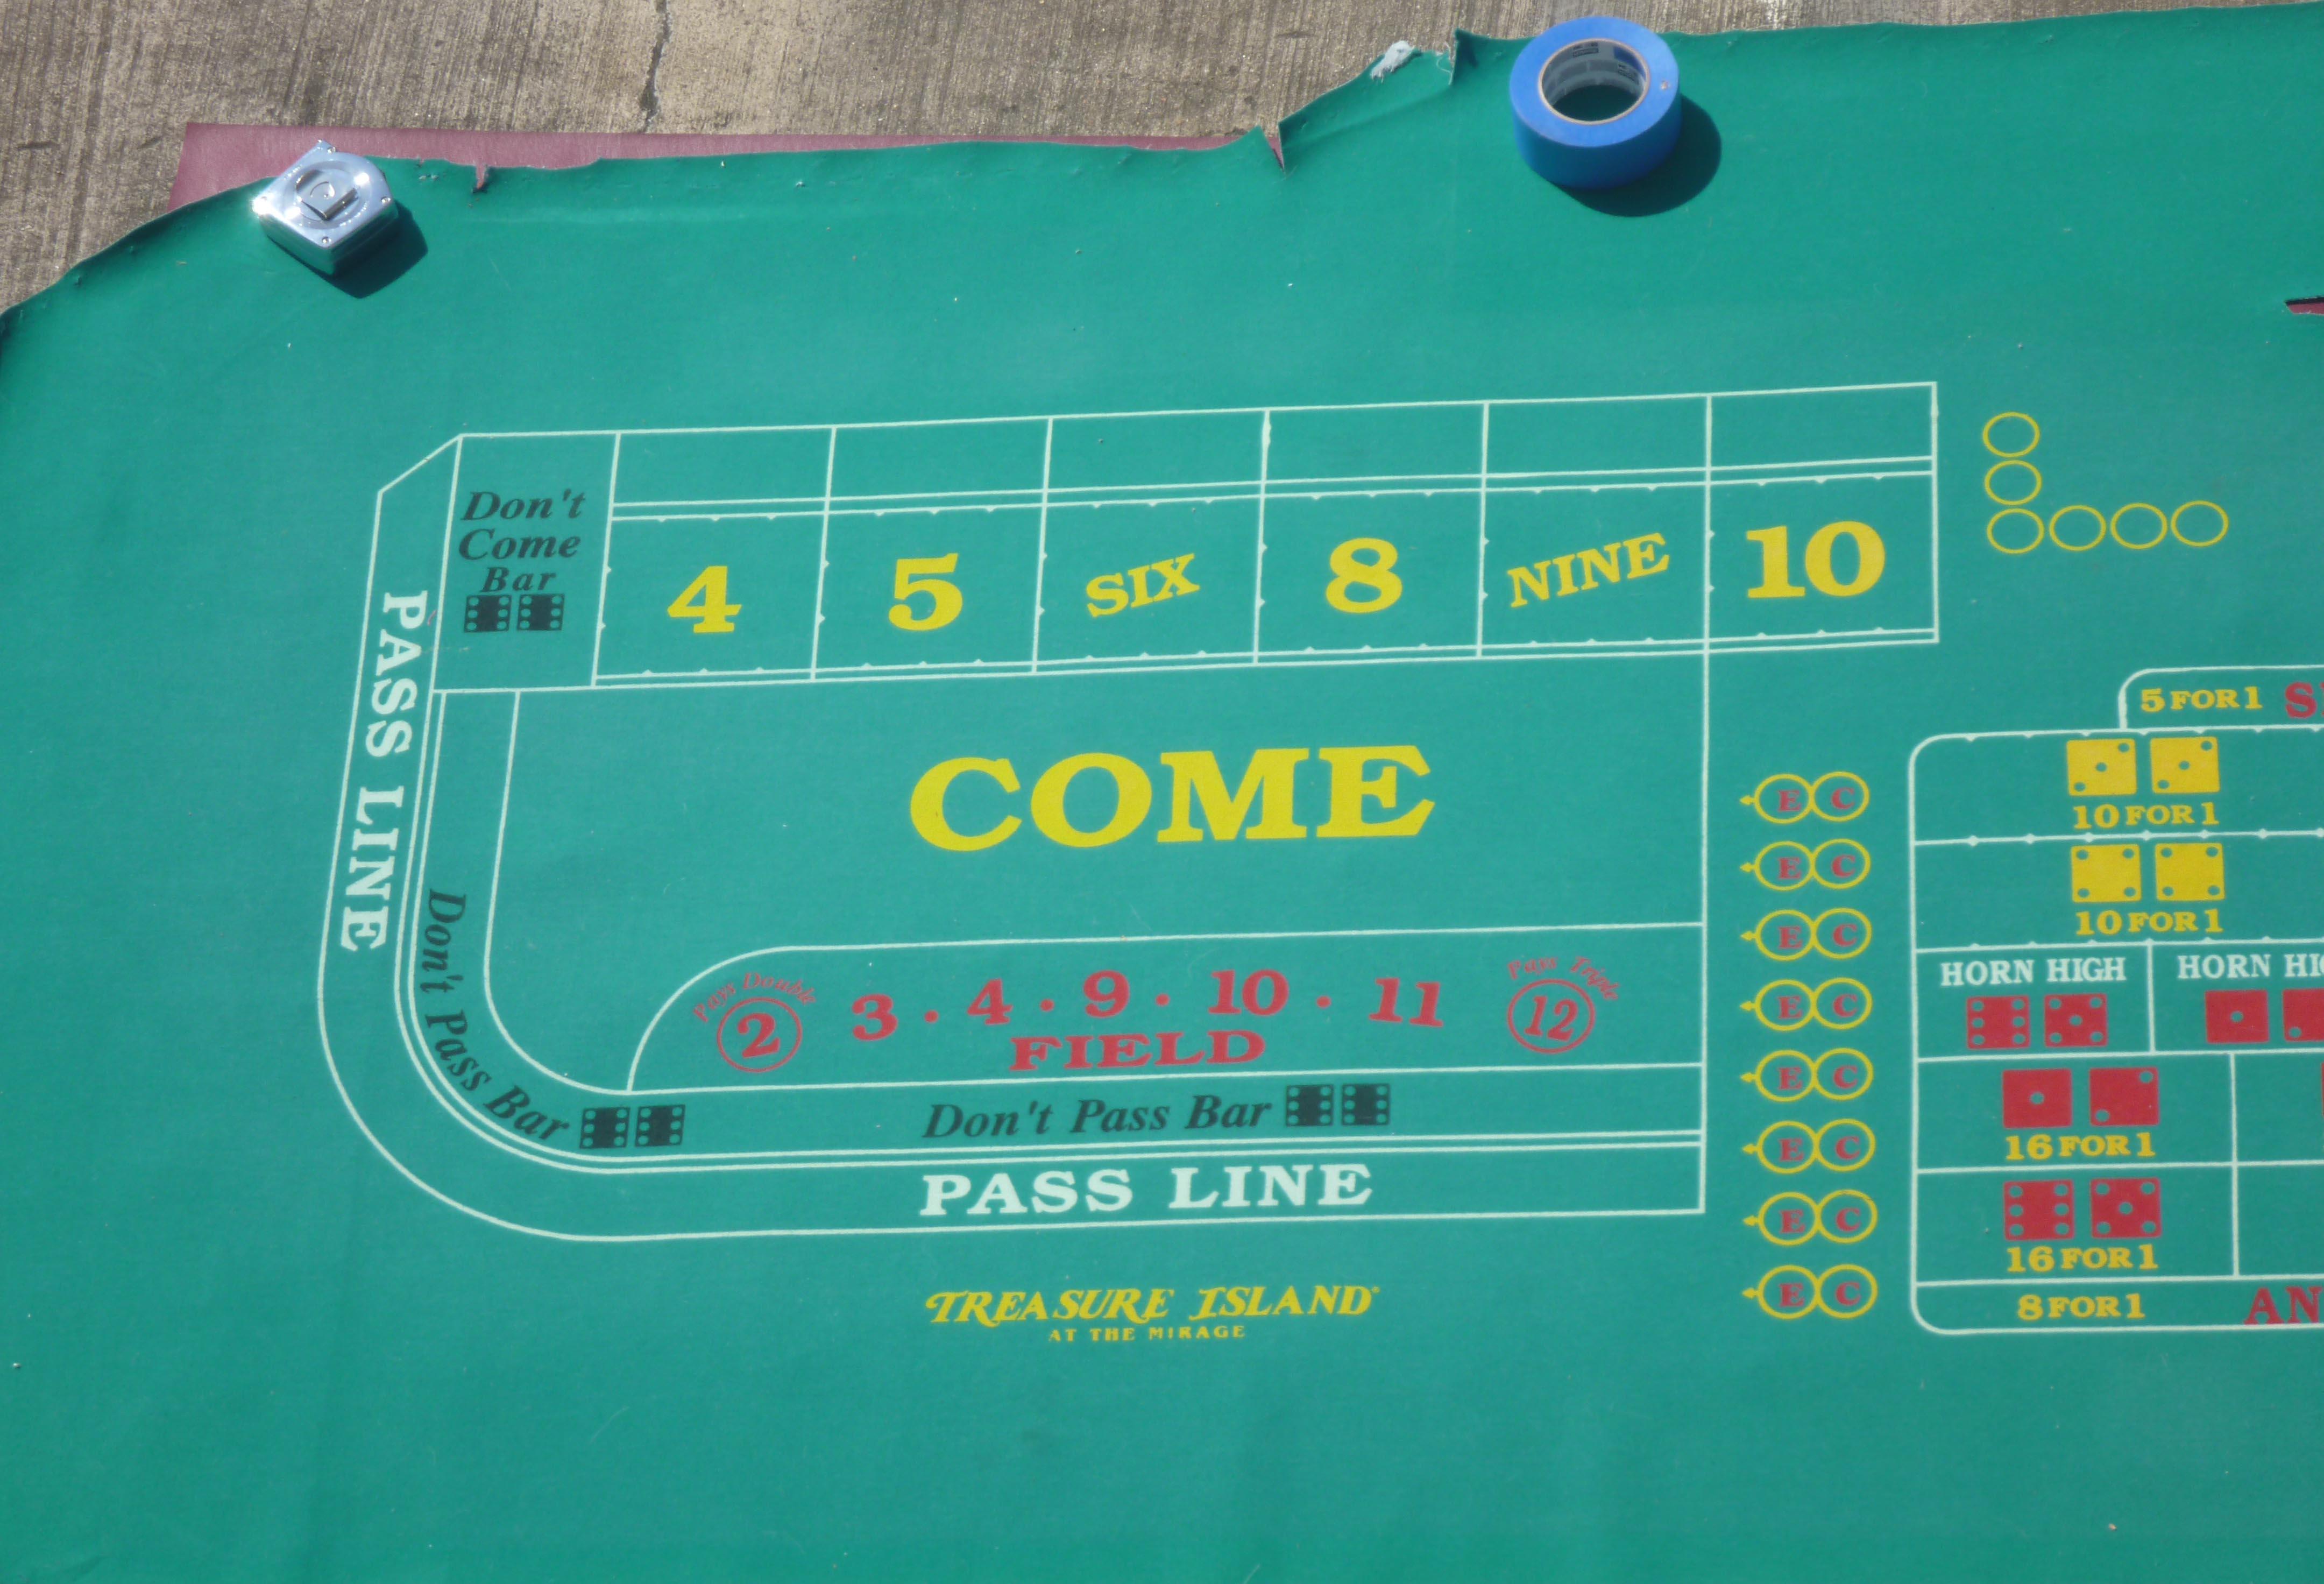 Blackjack betting options